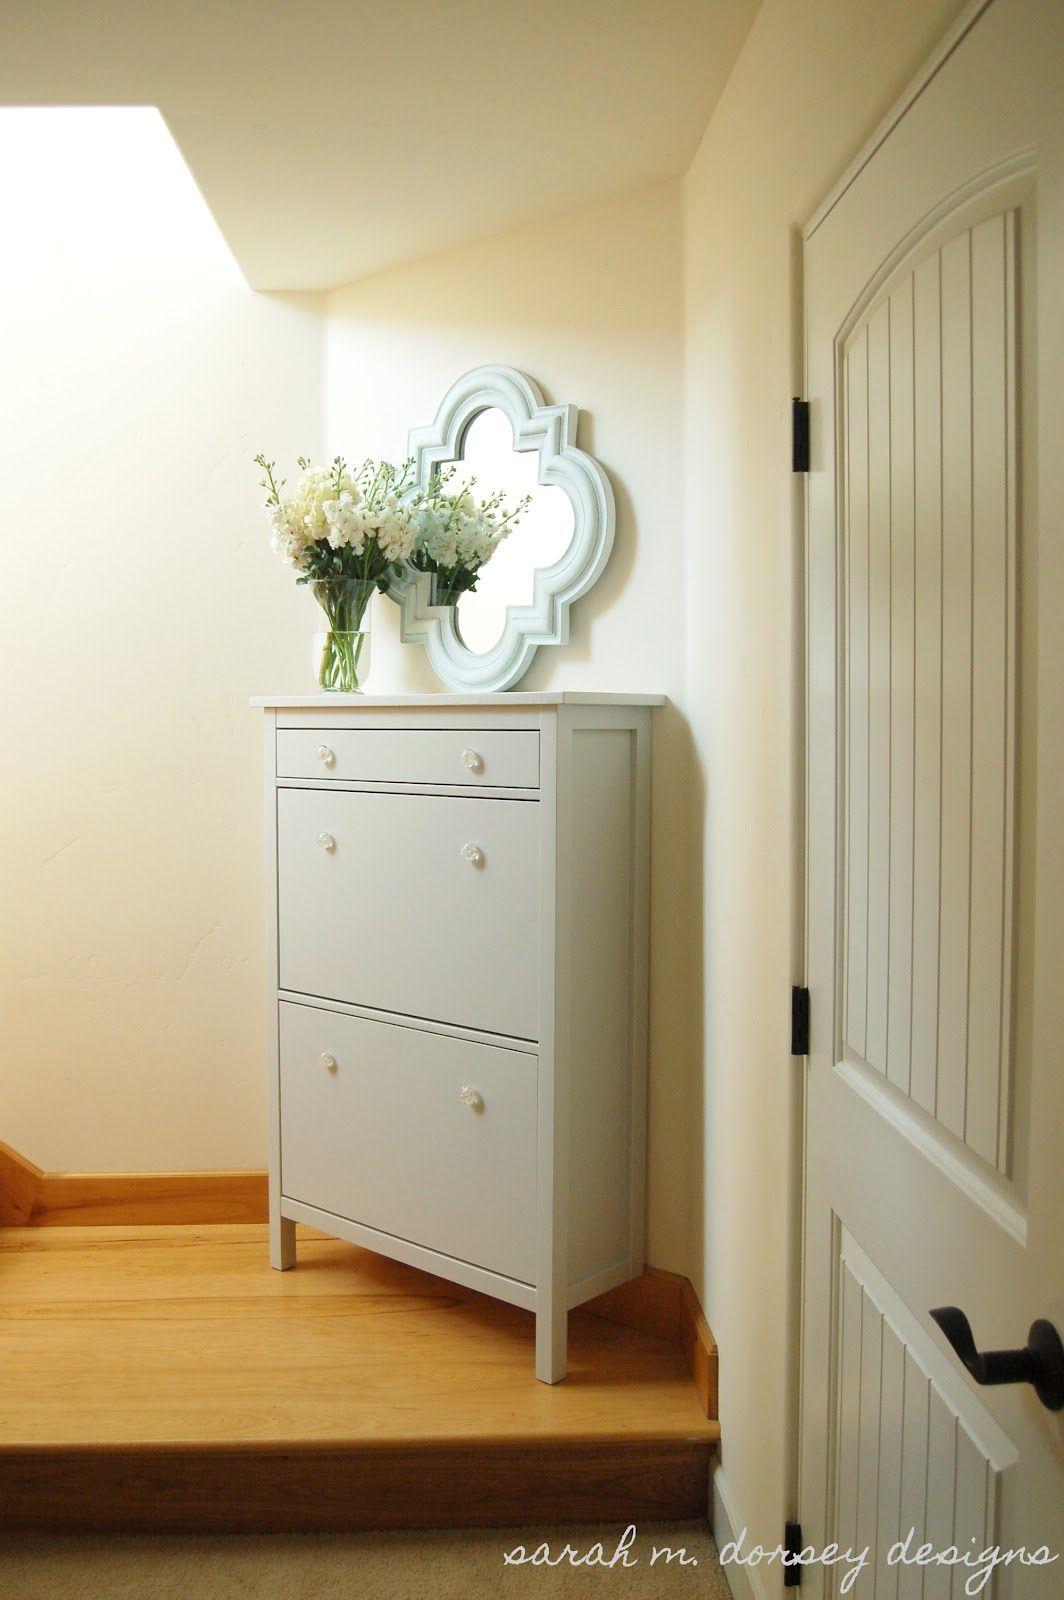 Sarah M Dorsey Designs Ikea Renovation Ikea Hemnes Shoe